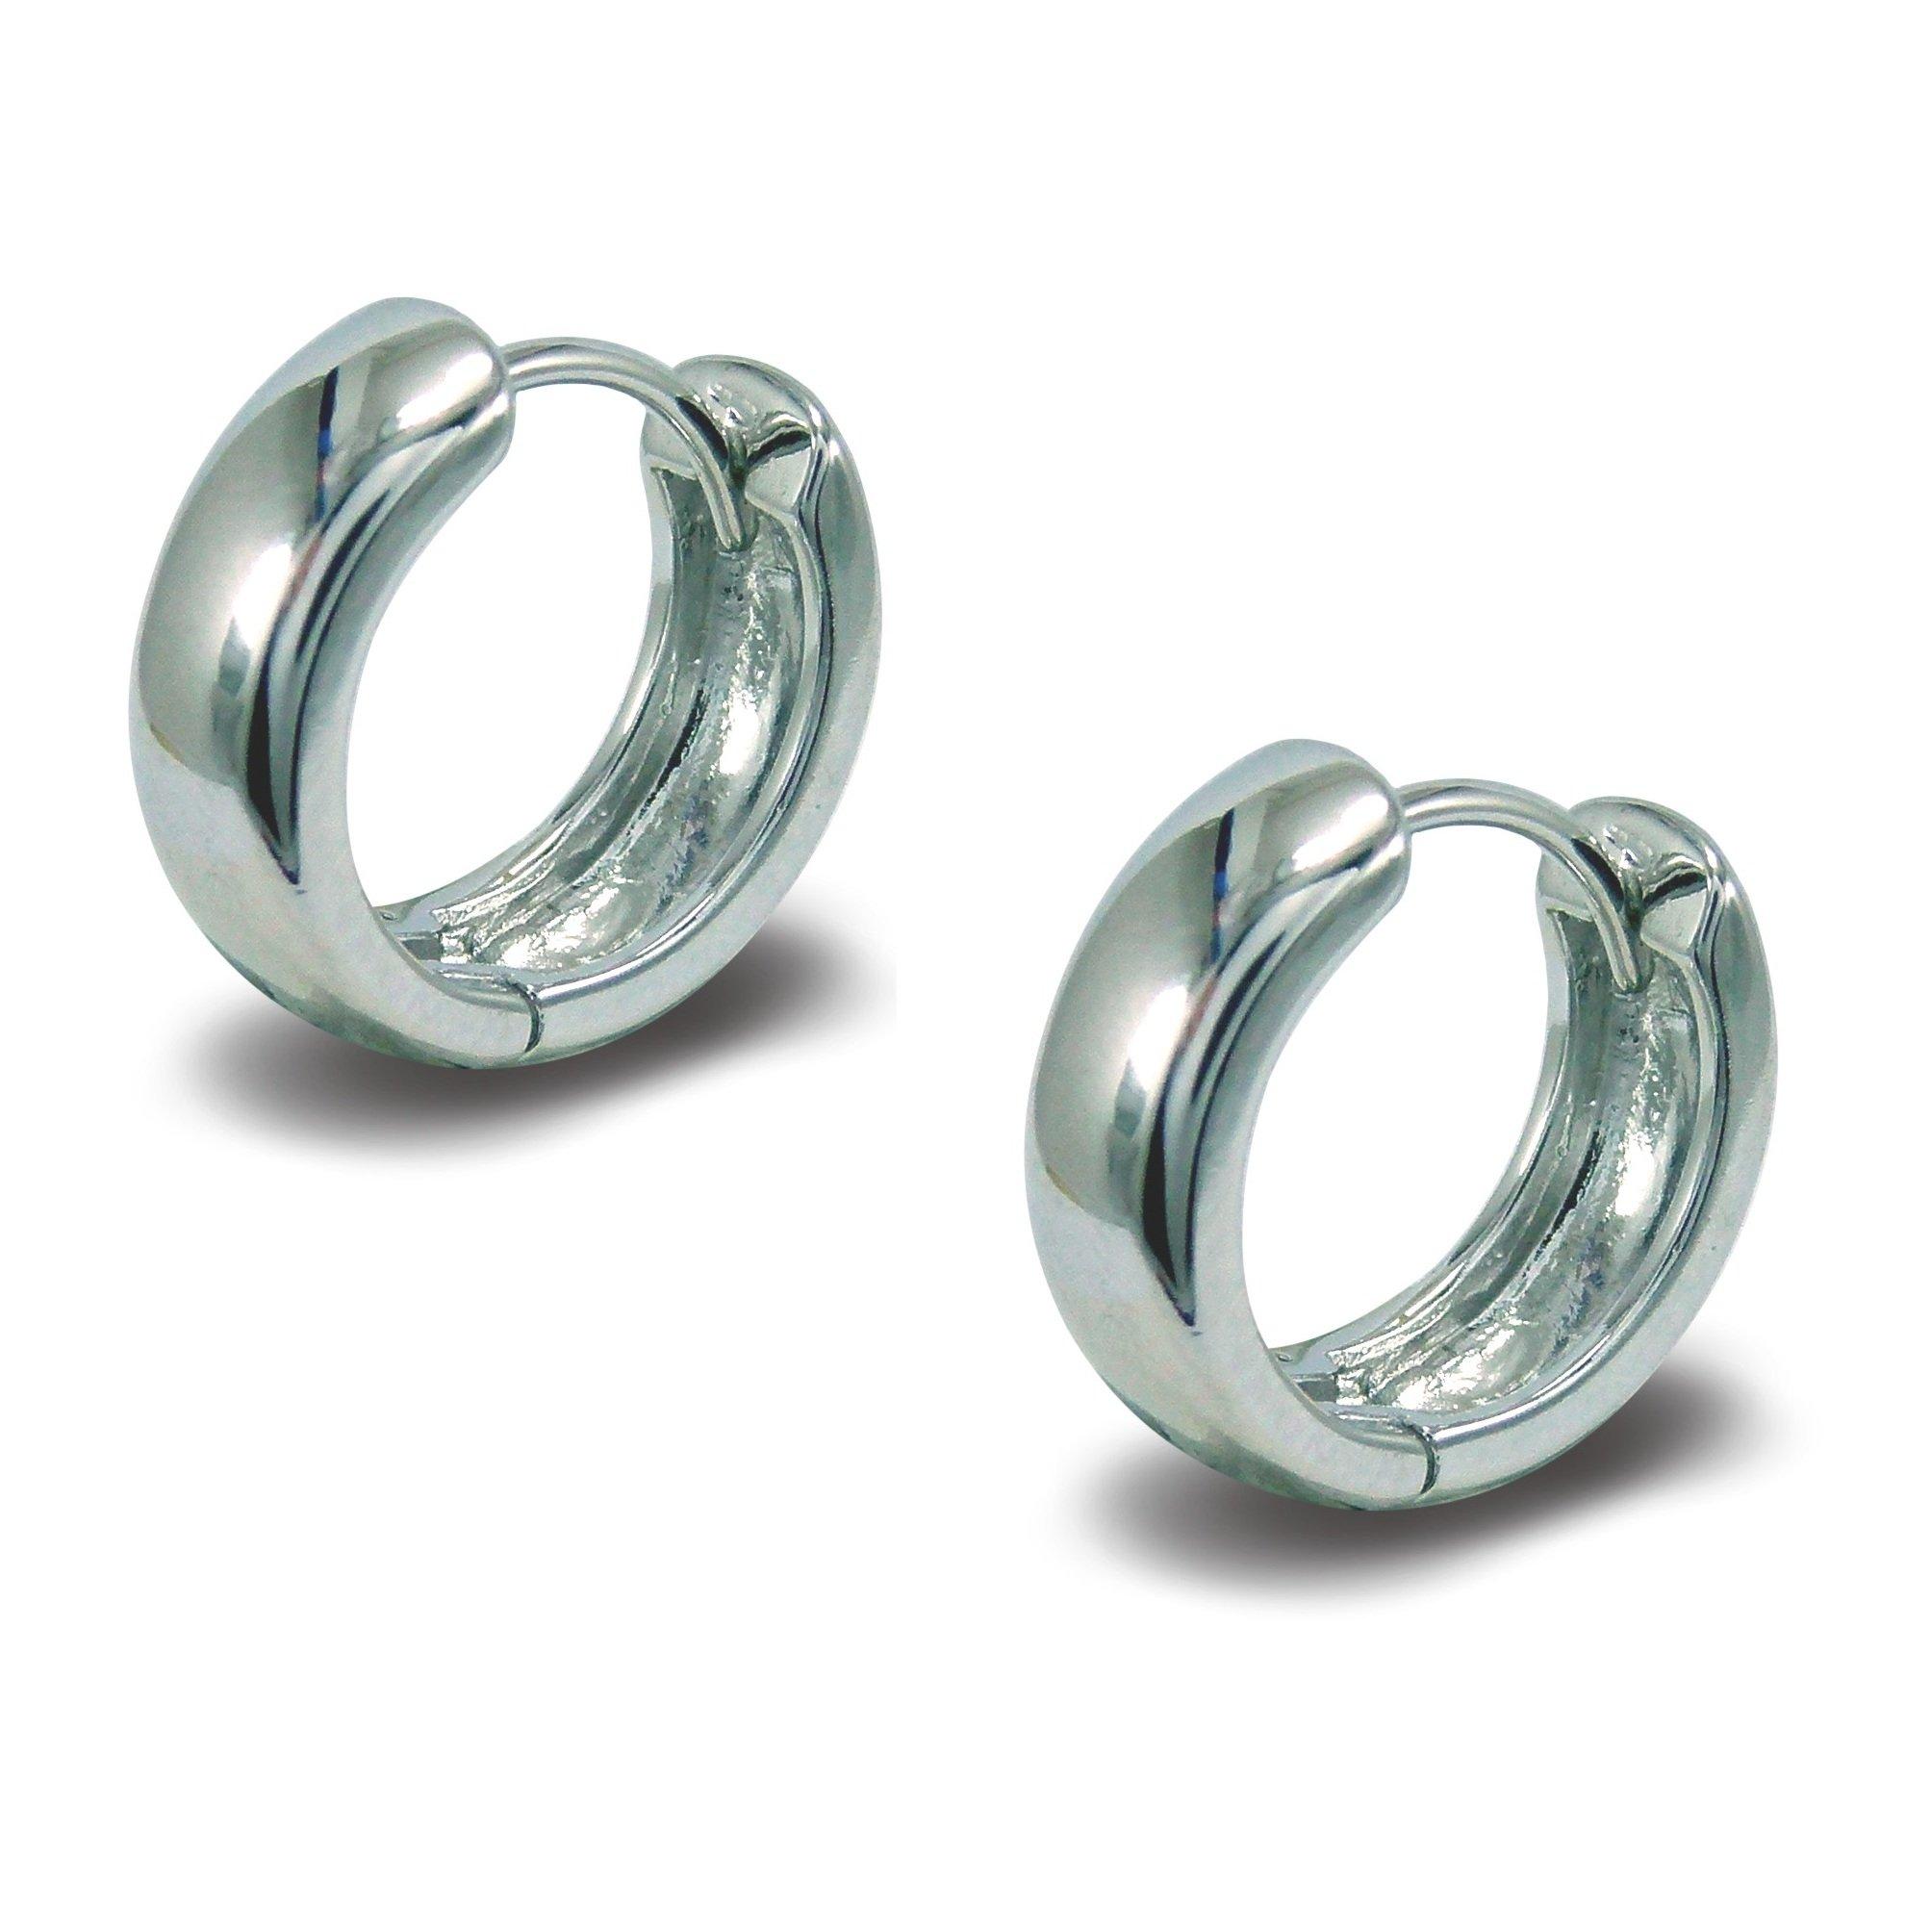 Blue Diamond Club – 18ct White Gold Filled Hoop Earrings Mens or Womens (Pair)